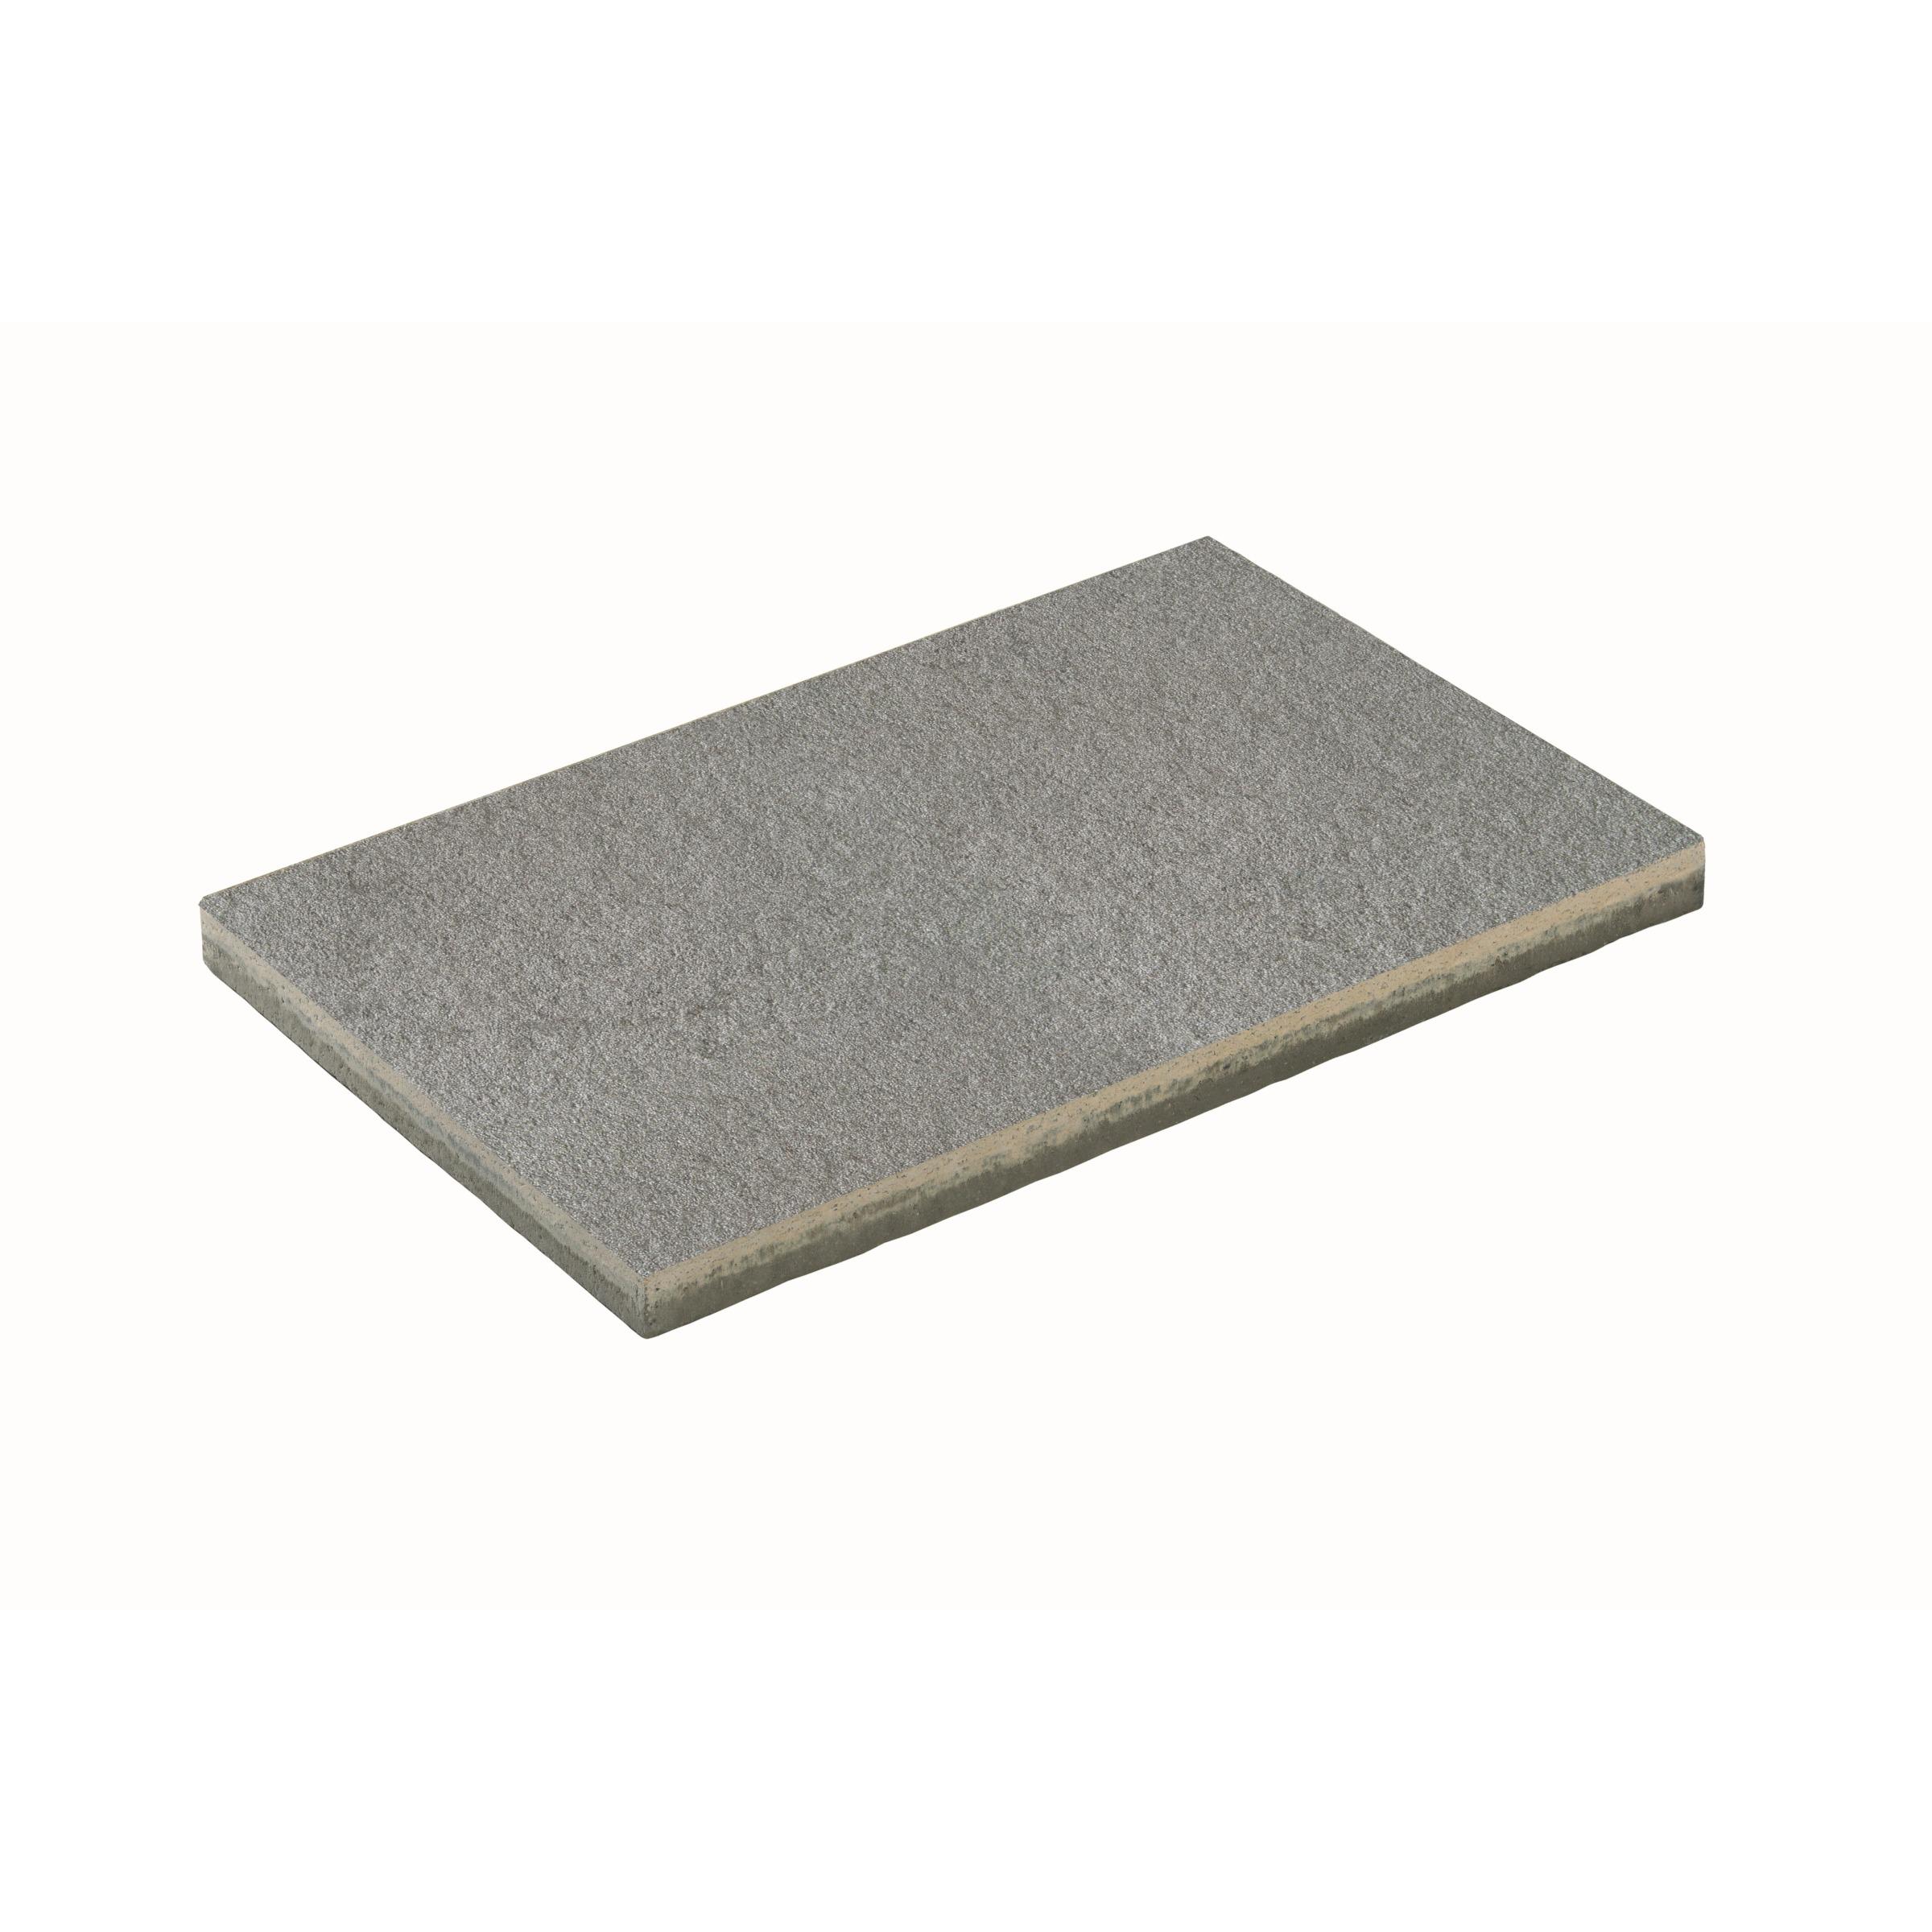 Terrastegel Beton Stuco Grijs 60x40 cm - Per Tegel - 0,24 m2